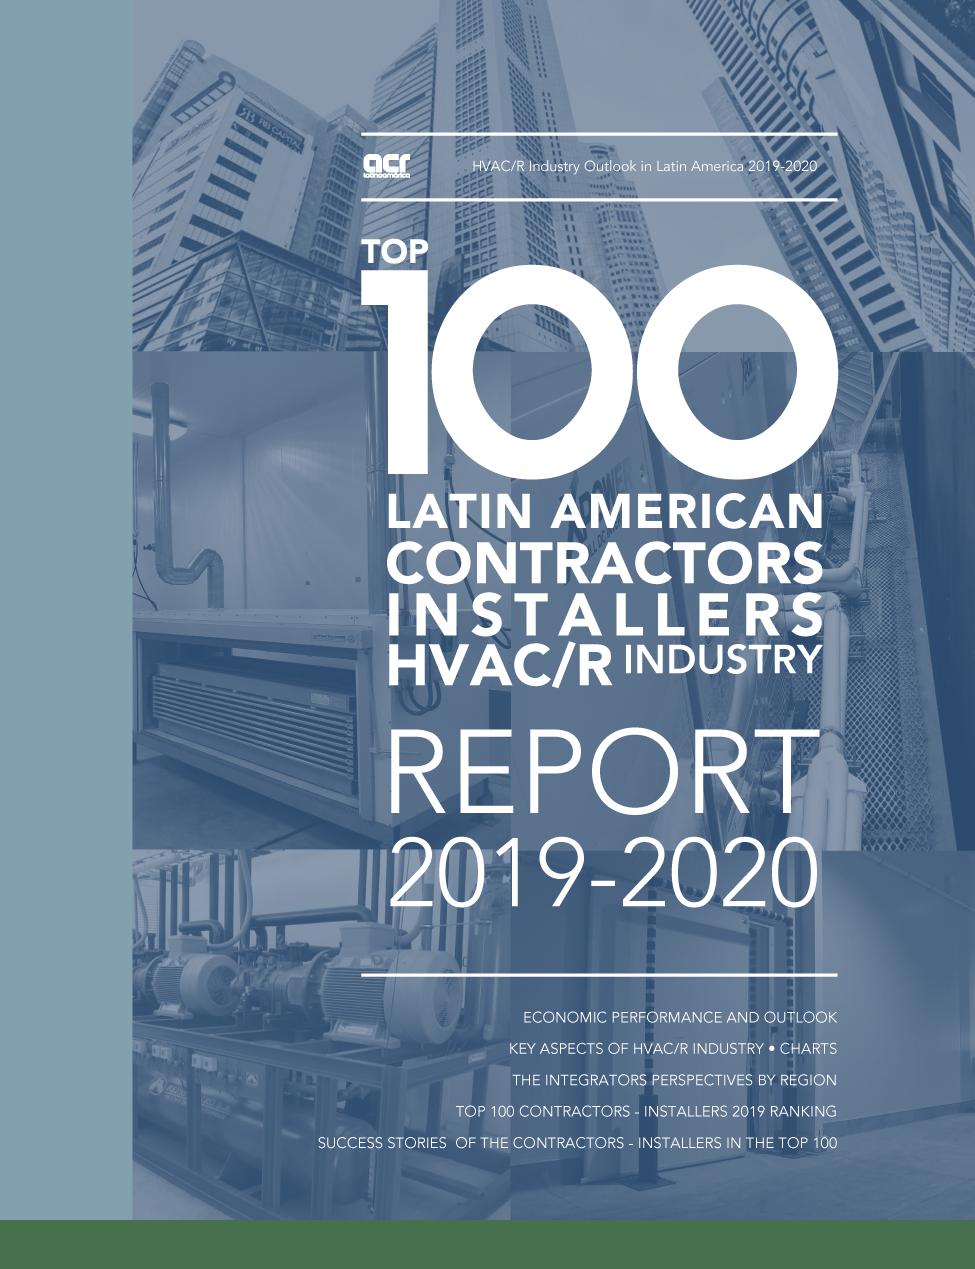 TOP 100 LATIN AMERICAN HVAC/R CONTRACTORS • 2019-2020 Image